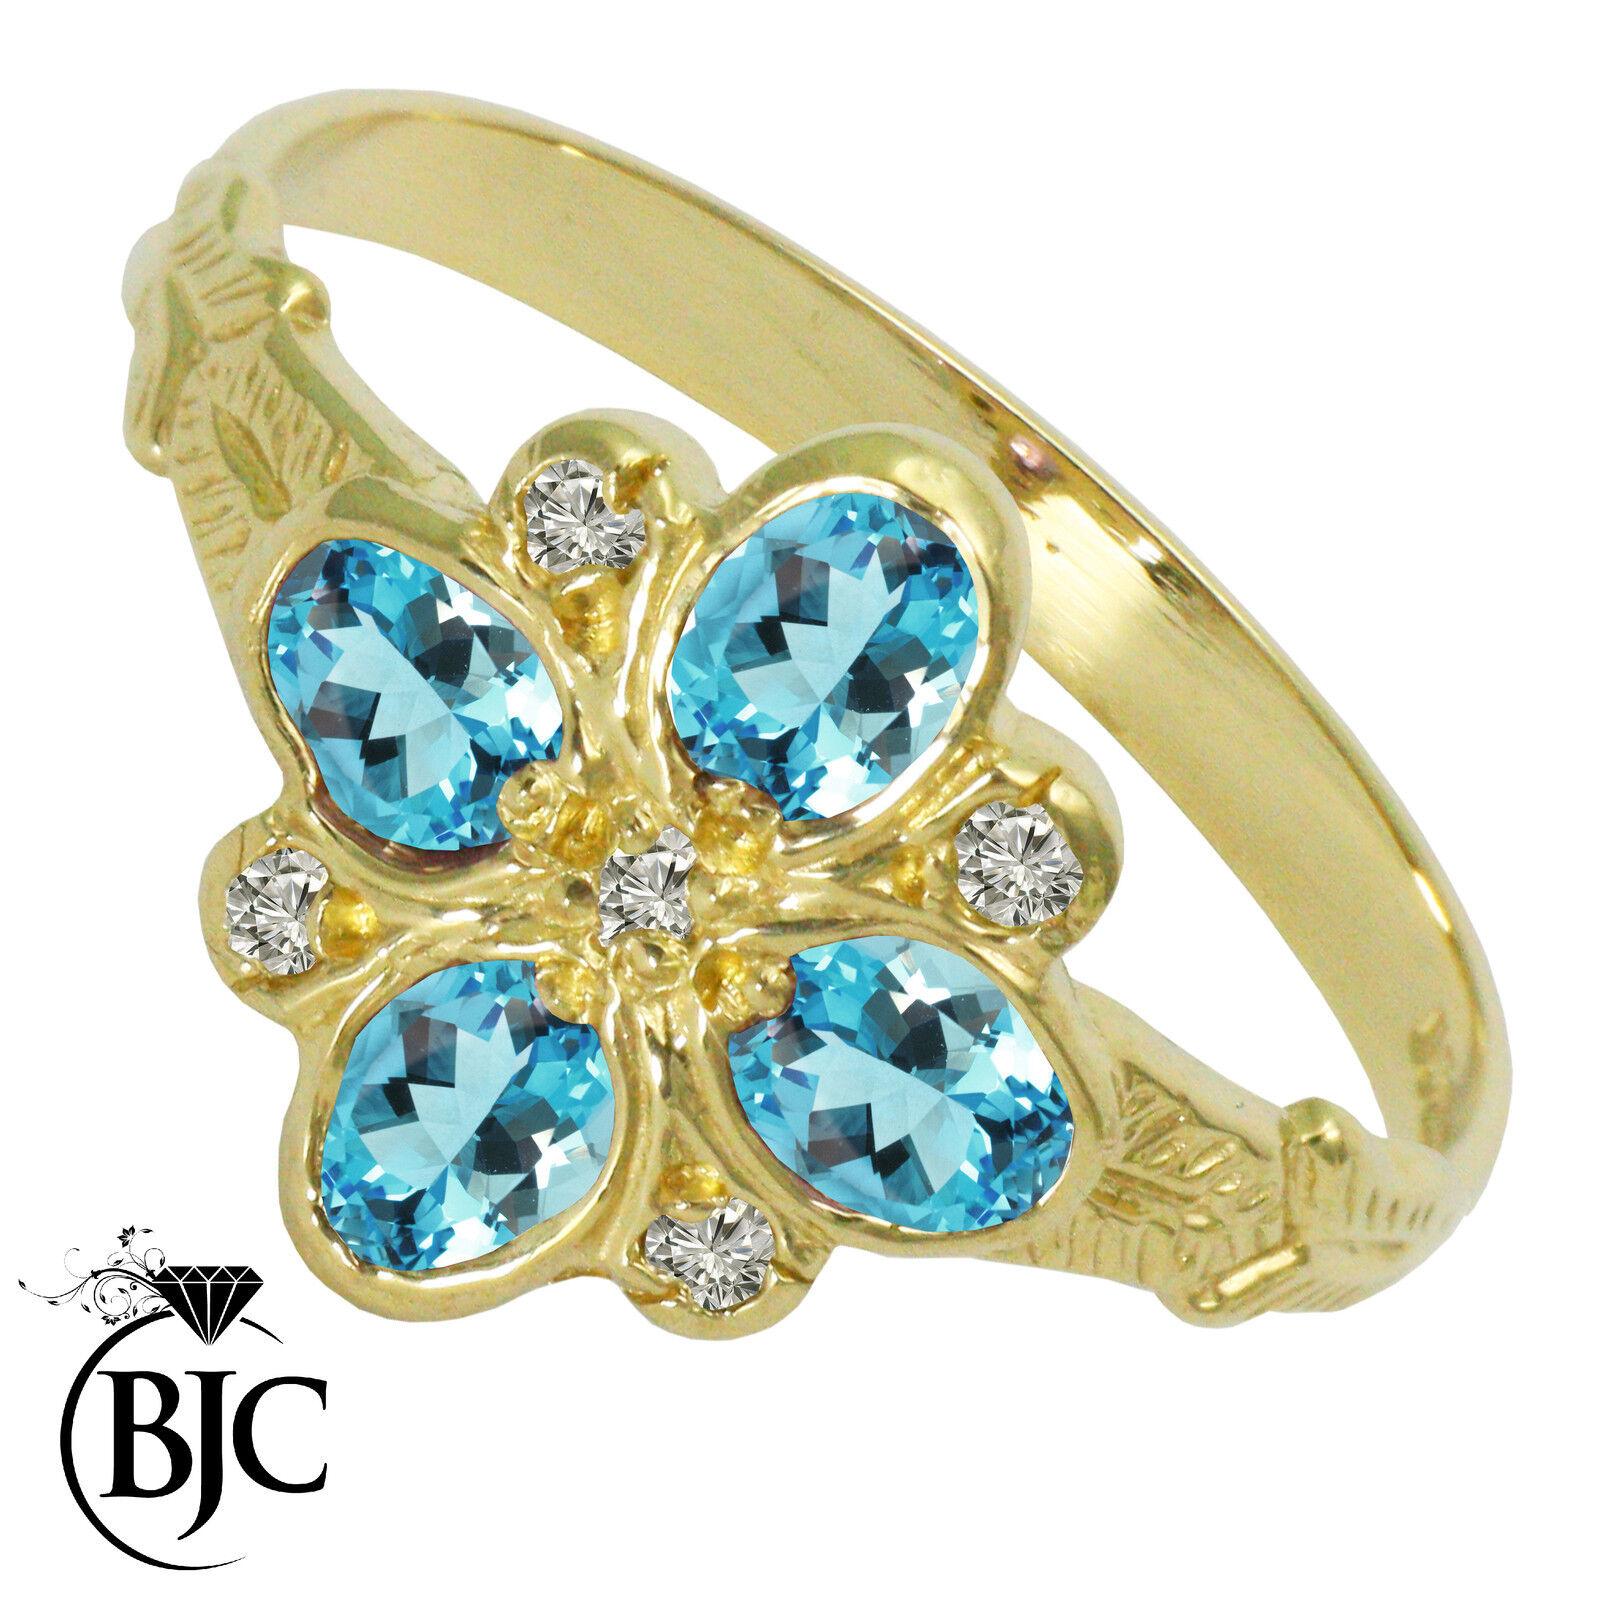 BJC® 9ct Yellow gold bluee Topaz & Diamond Art Deco size O engagement ring R204